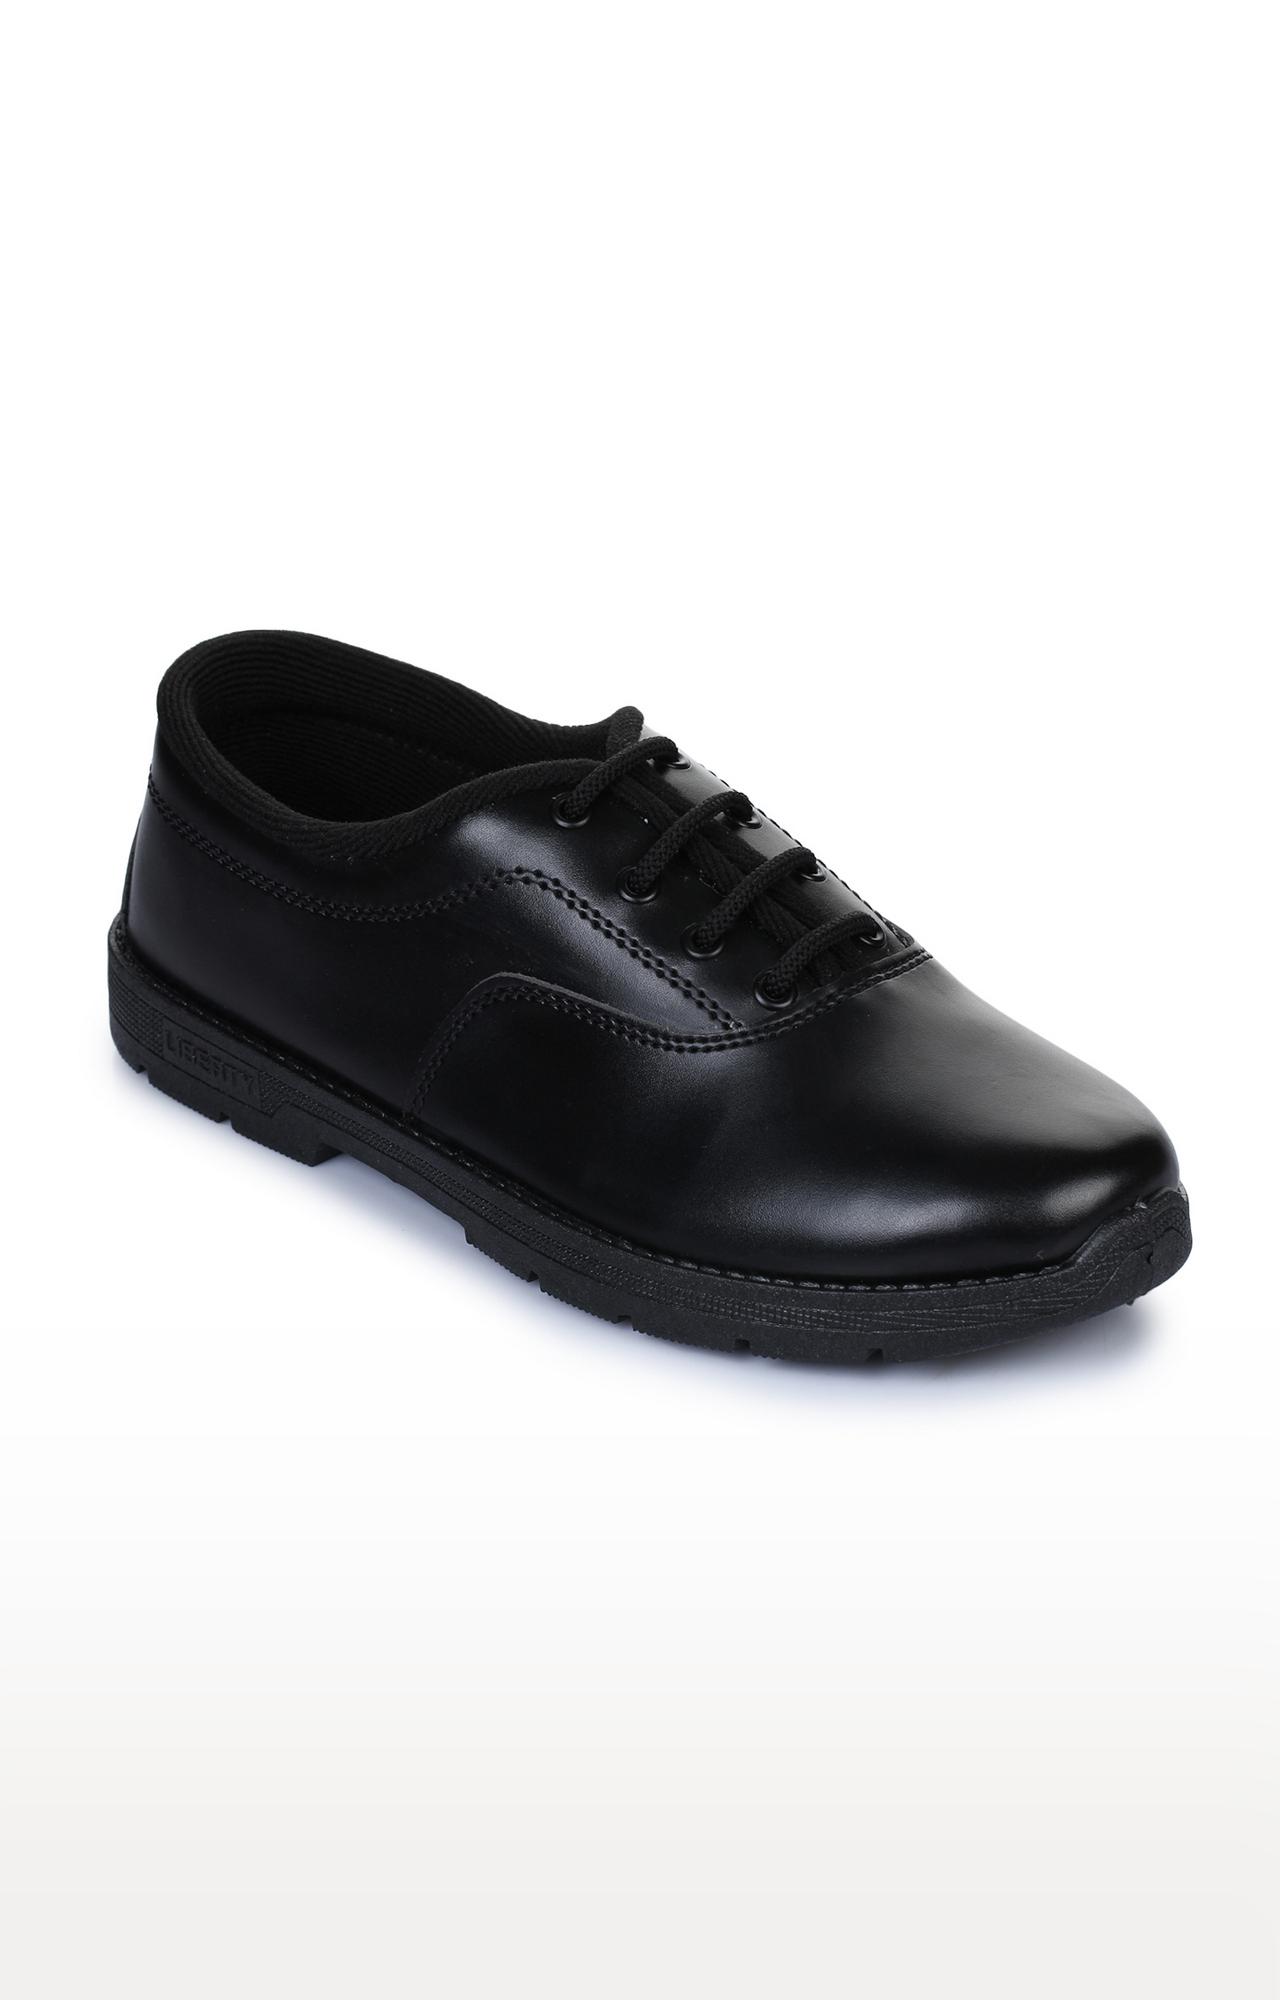 Liberty | Prefect by Liberty Unisex Black School Shoes